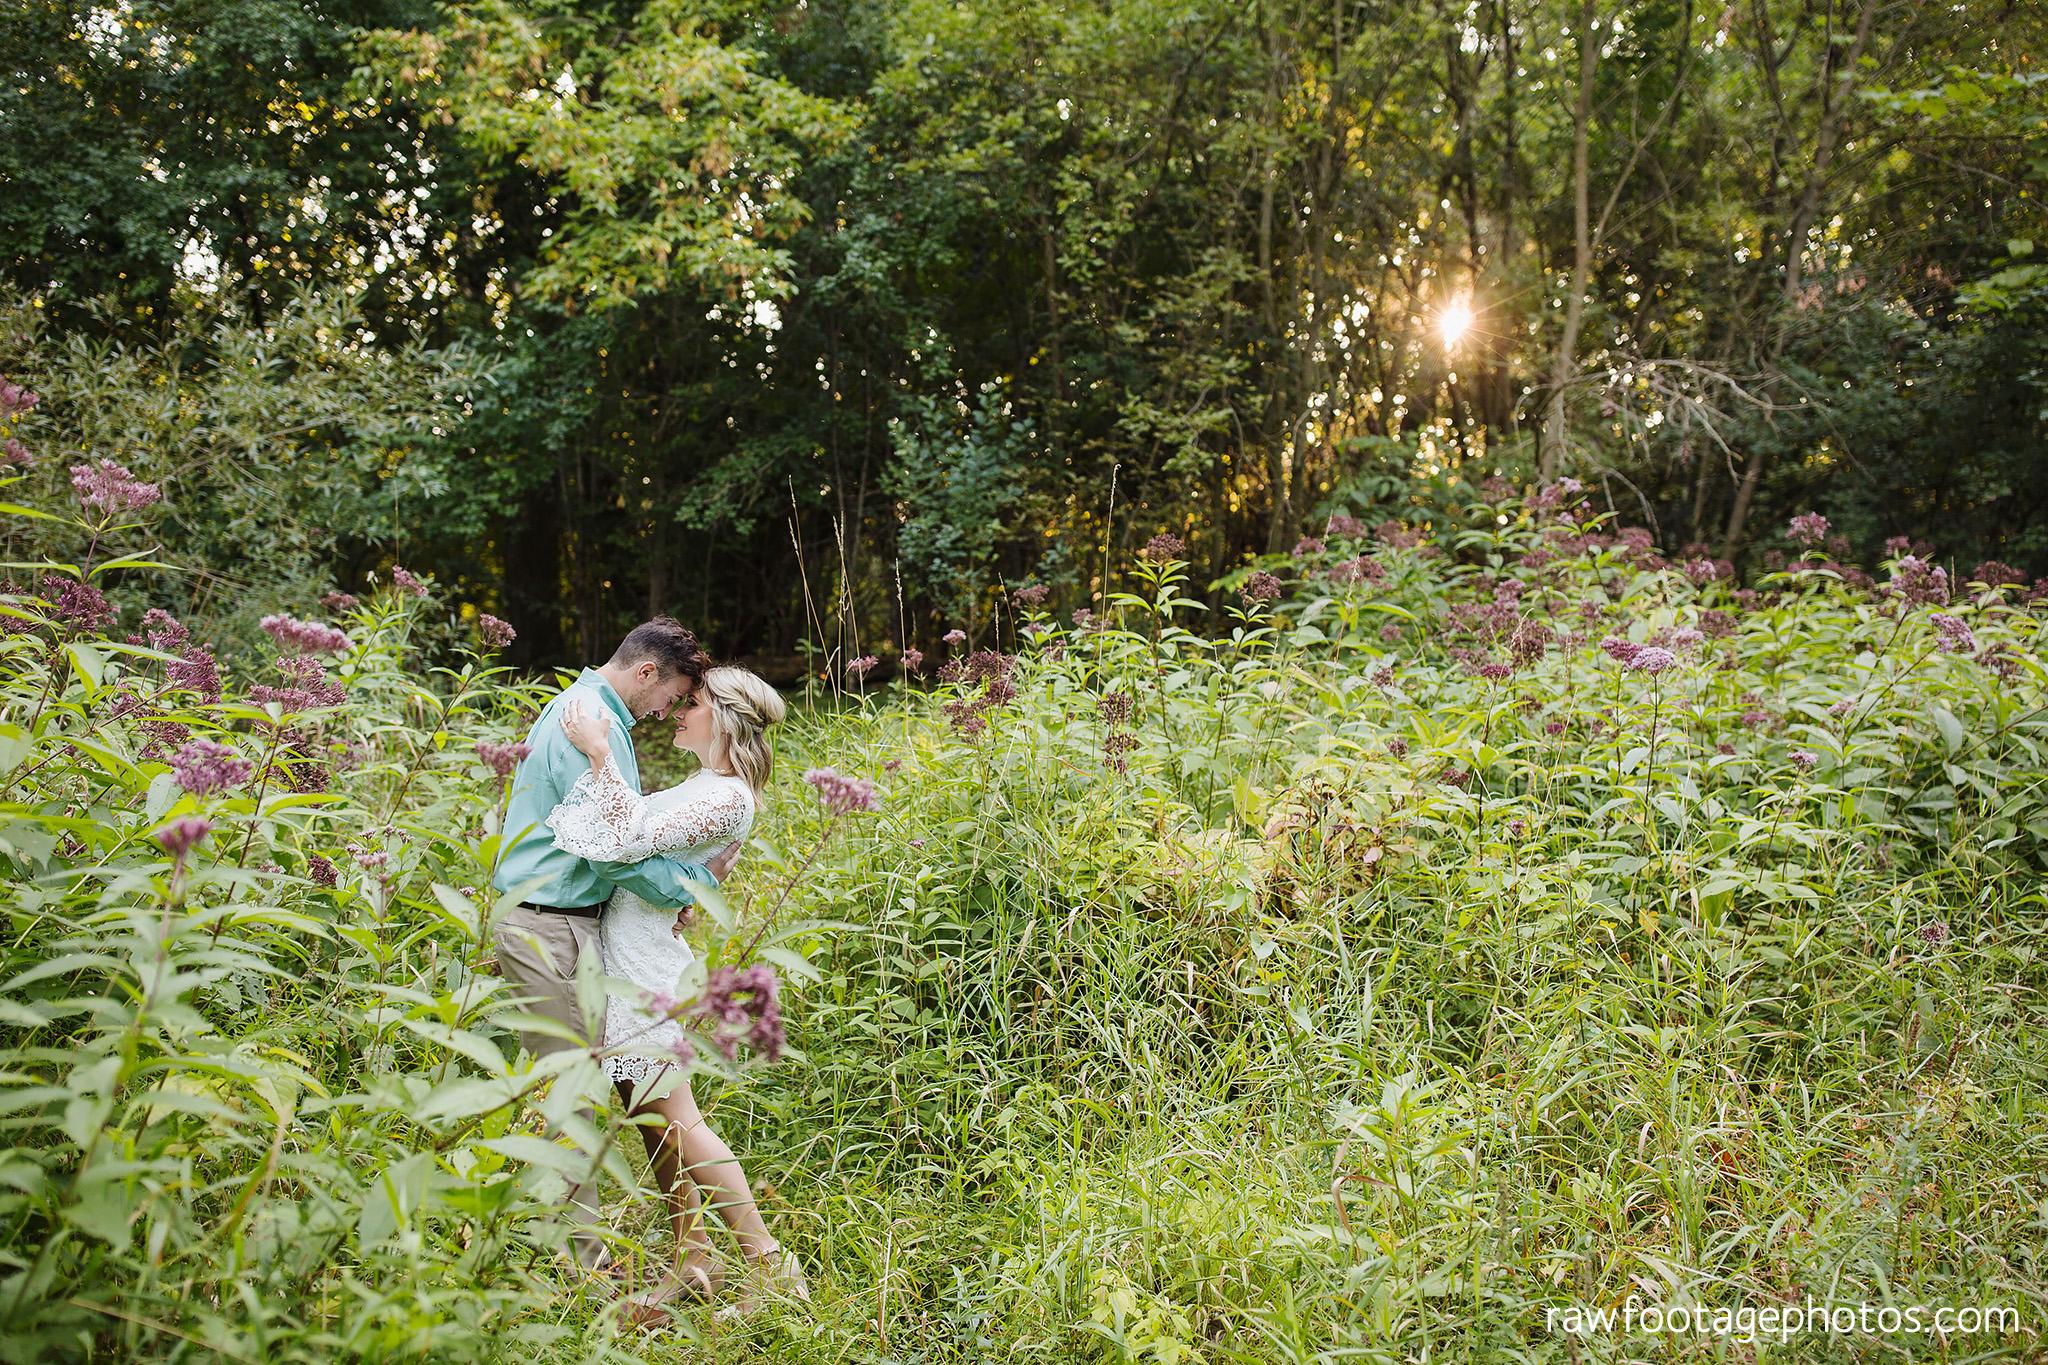 london_ontario_wedding_photographer-raw_footage_photography-engagement_session-uwo-campus-gibbons_park-woods026.jpg